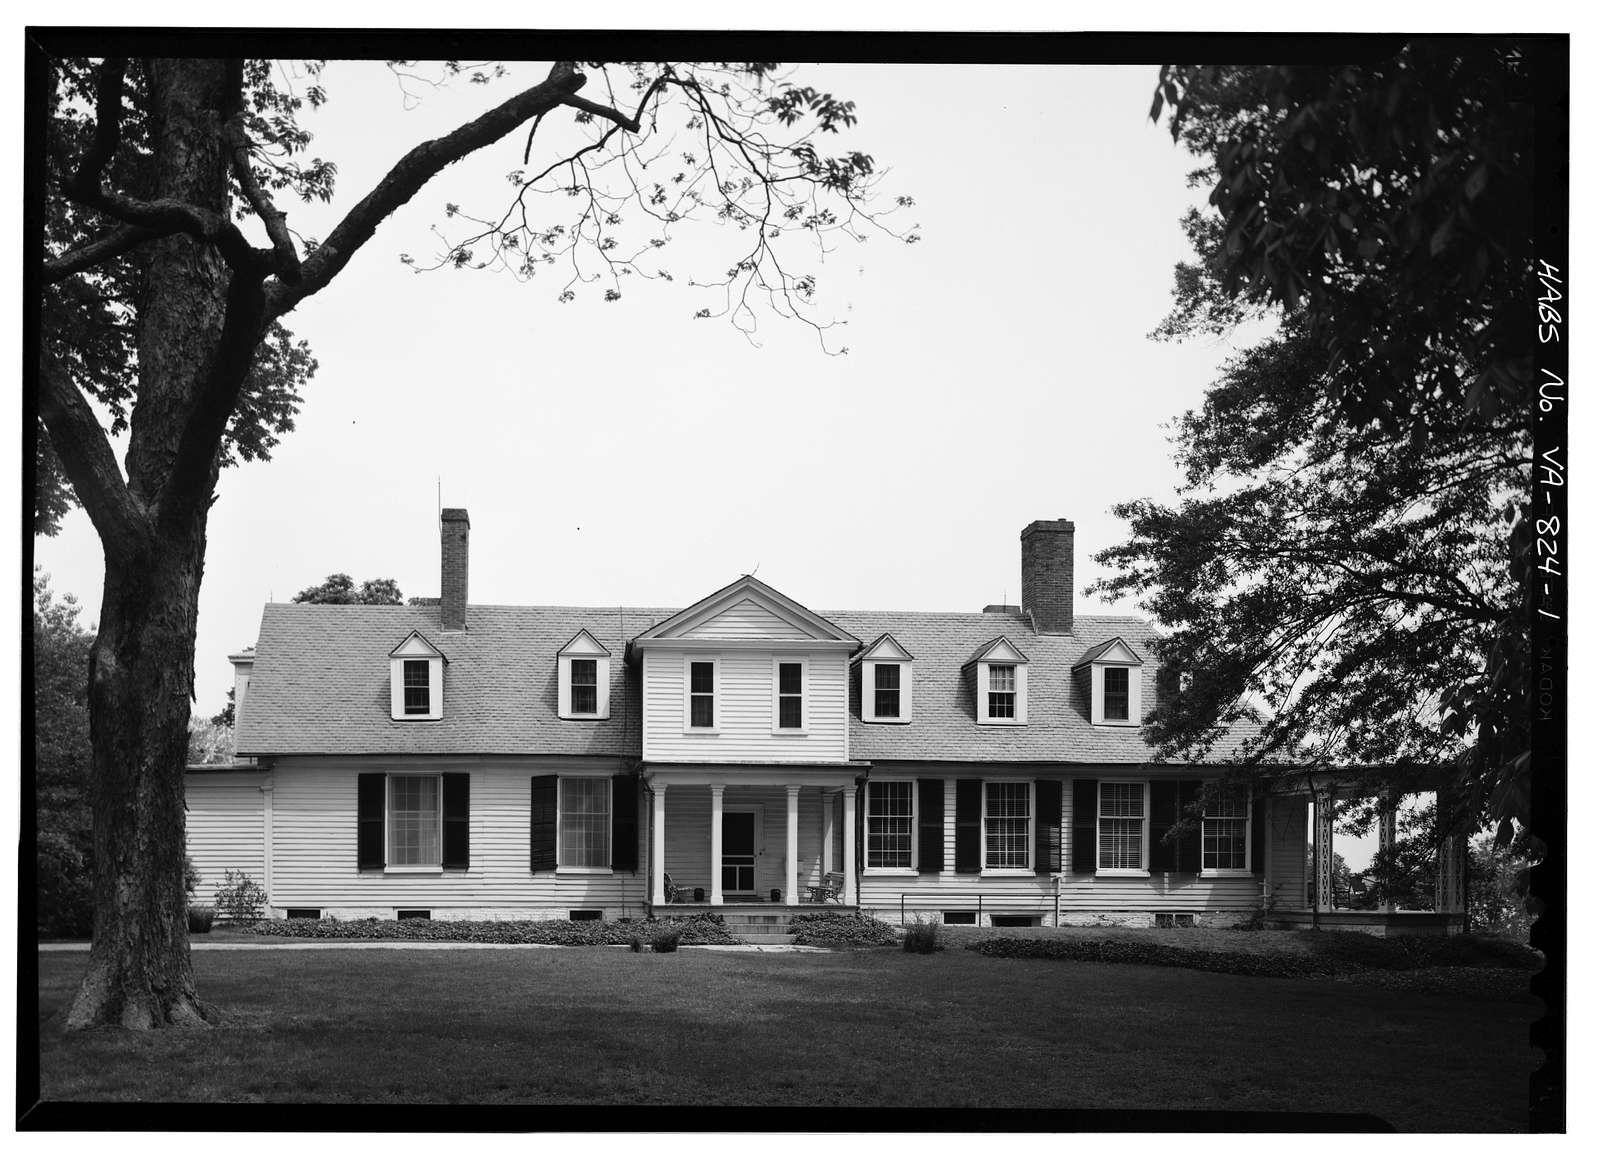 Appomattox Manor, Cedar Lane, Hopewell, Hopewell, VA